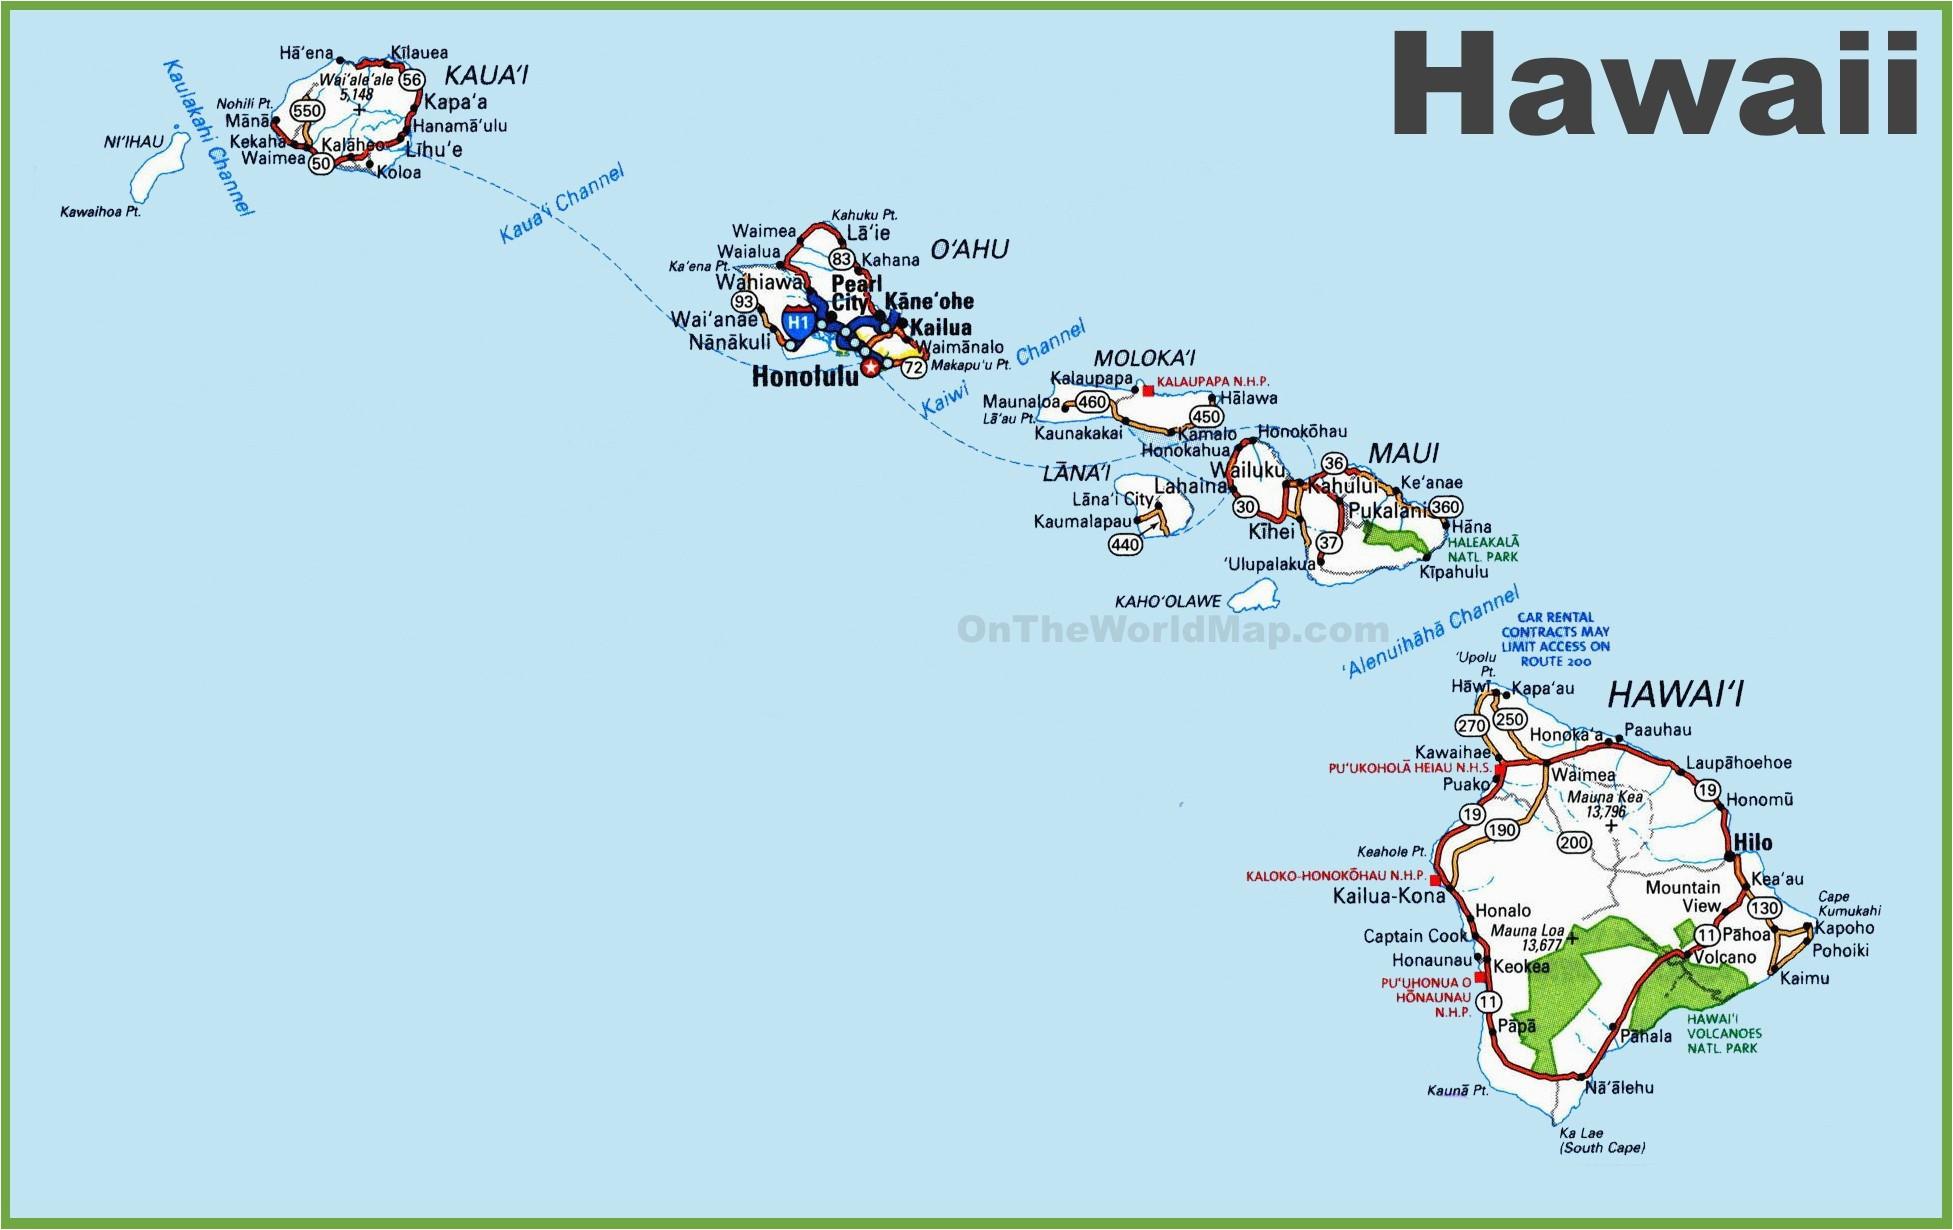 Map Of Hawaiian islands and California Map Hawaii 12 In West ... Map Hawaiian Islands on mauna loa, french polynesia map, oahu map, diamond head, james cook, hawaiian language, honolulu map, caribbean islands map, waikīkī, kauai map, hawaiian island chain, new zealand map, aleutian islands map, tropical island map, necker island, hawaiian island colors, midway atoll, tasmania map, hawaii map, maui map, pacific islands map, big island map, bahamas map, austria map, ford island map, mauna kea, new caledonia map, japan map,